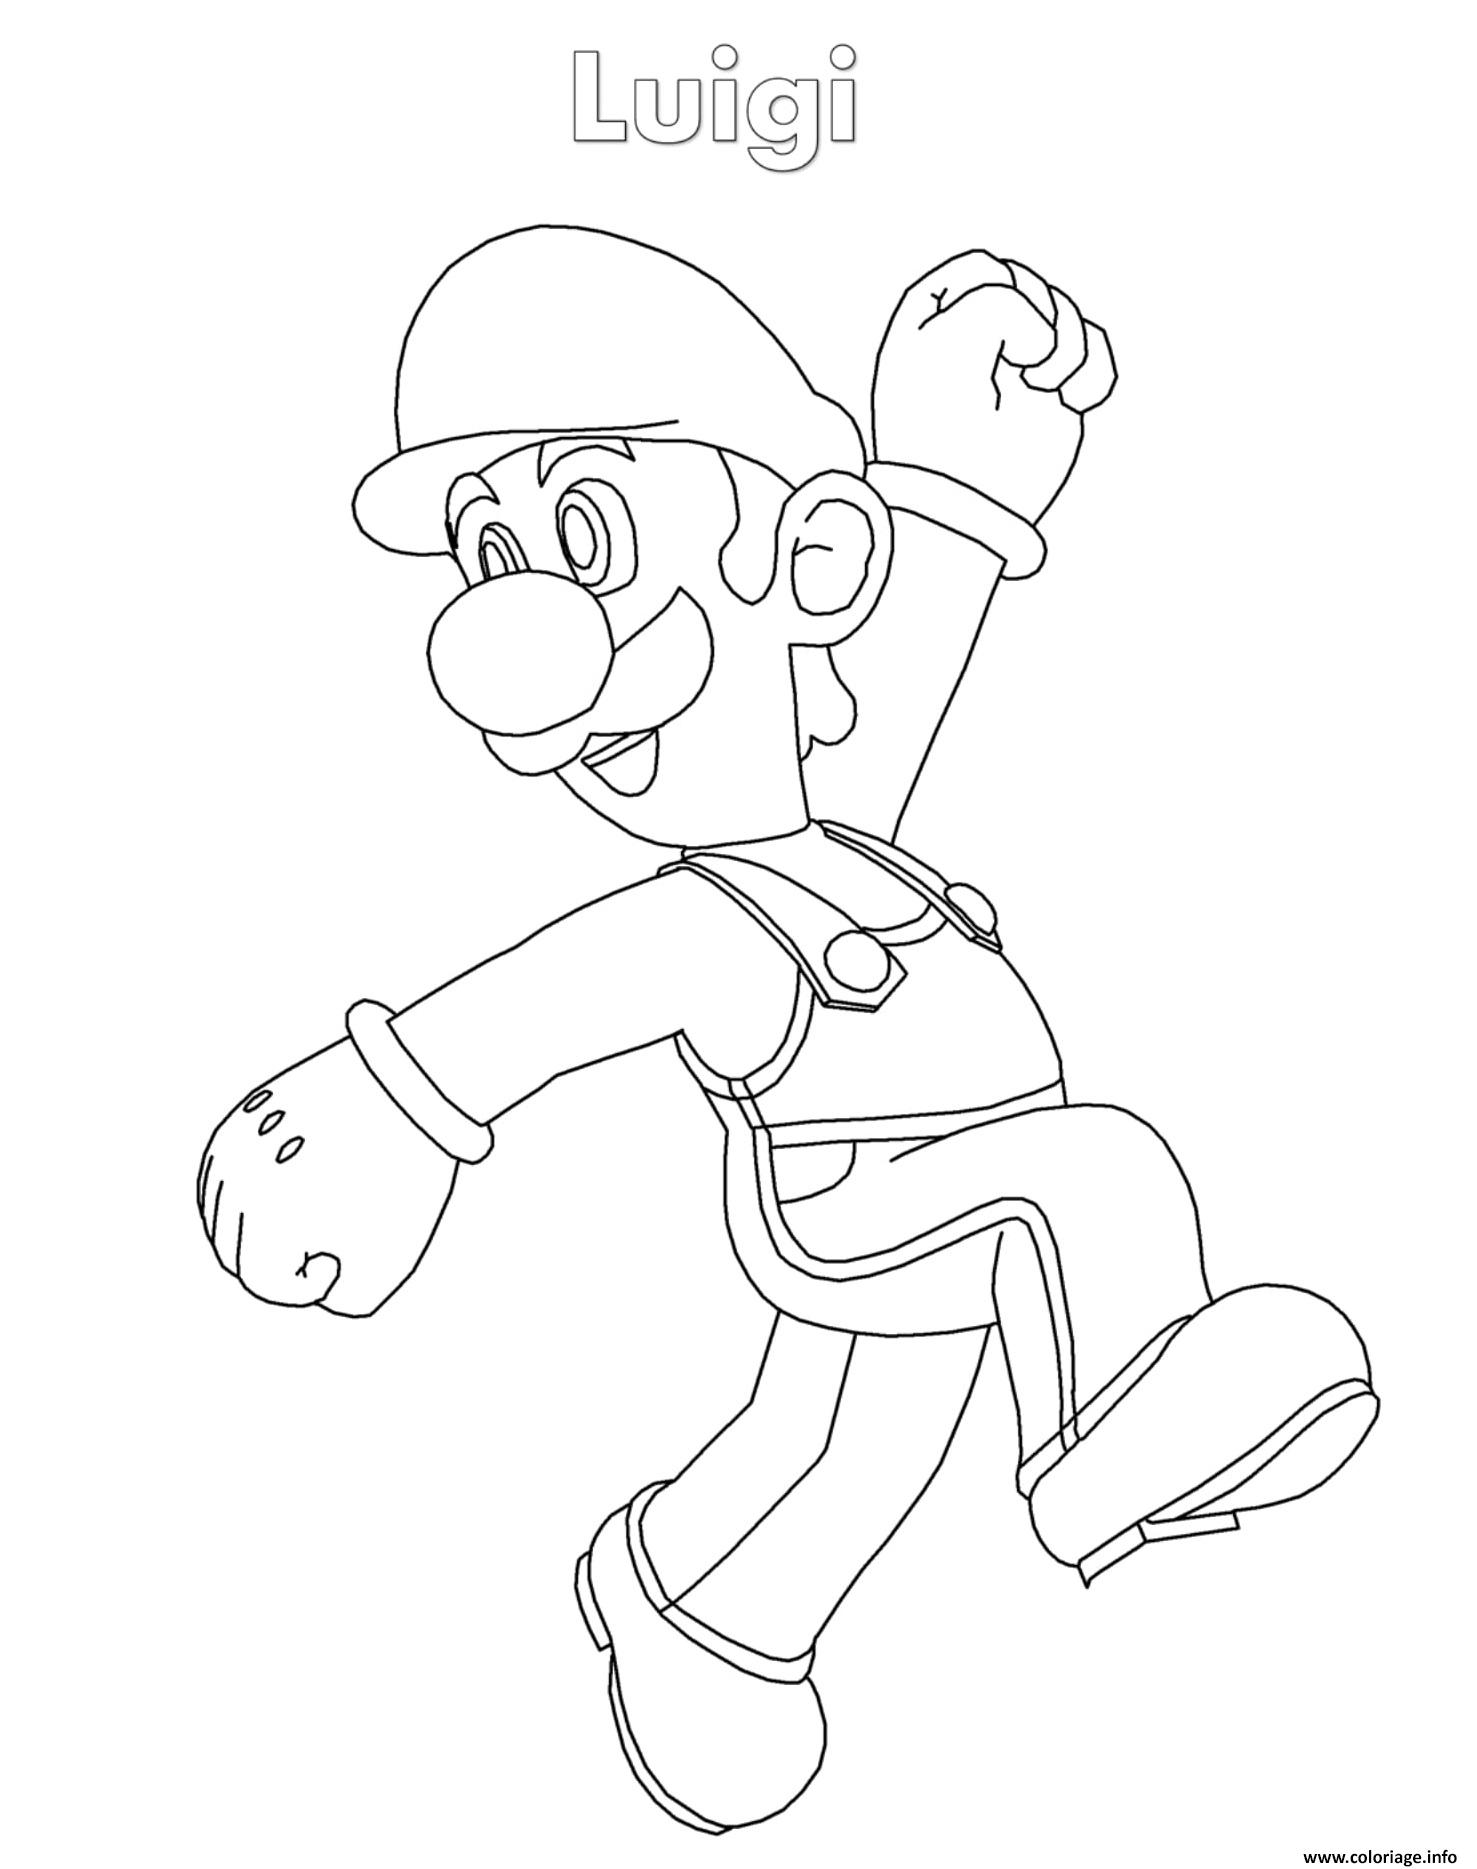 Coloriage Luigi Super Mario Nintendo Jecolorie Com